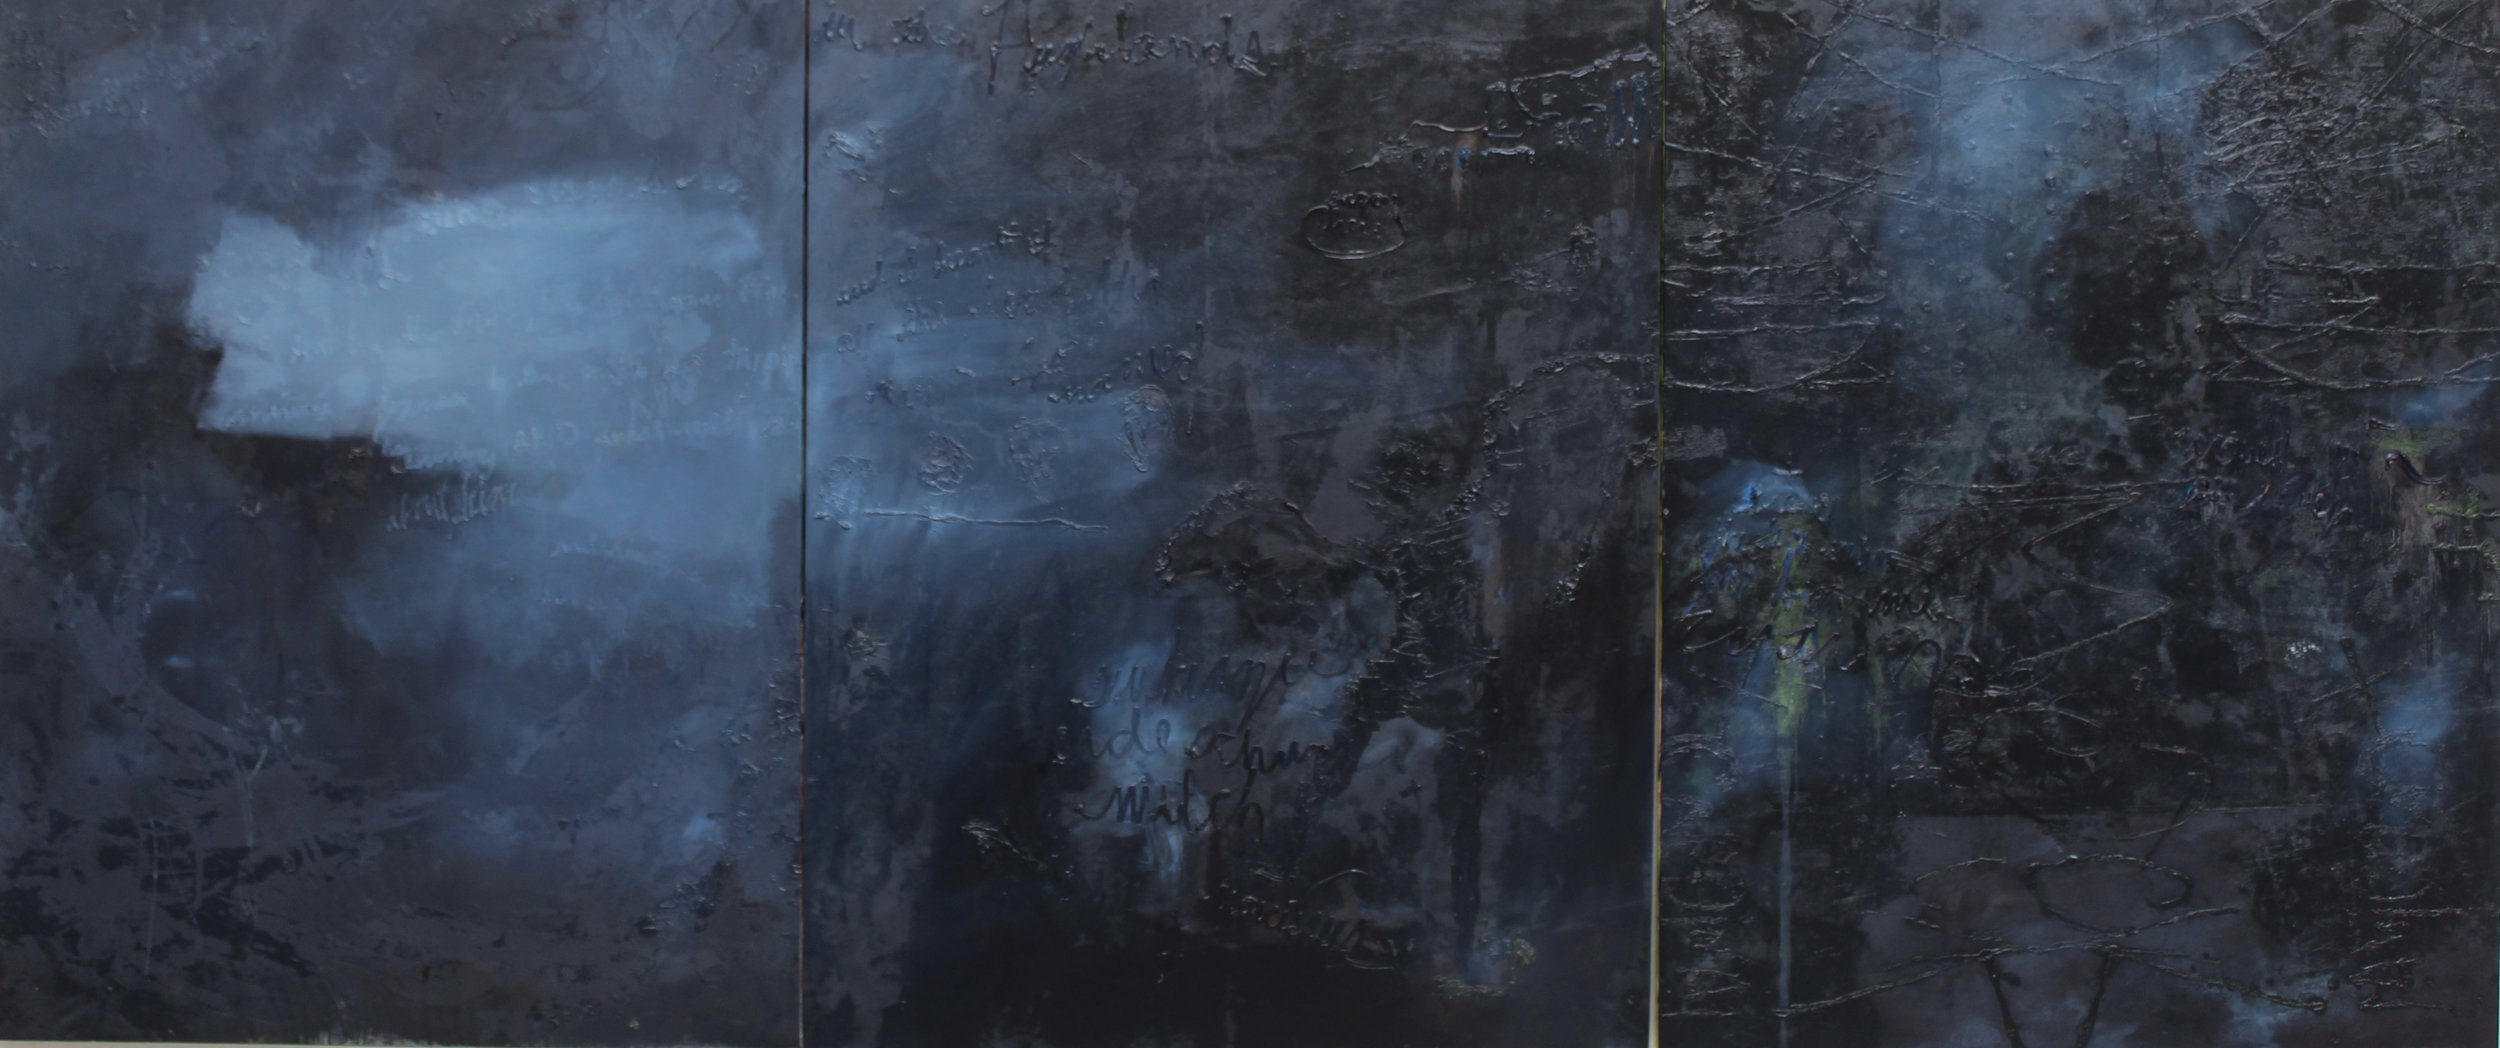 The Highlands, 66'' x 156'', oil on canvas, 2018-2019